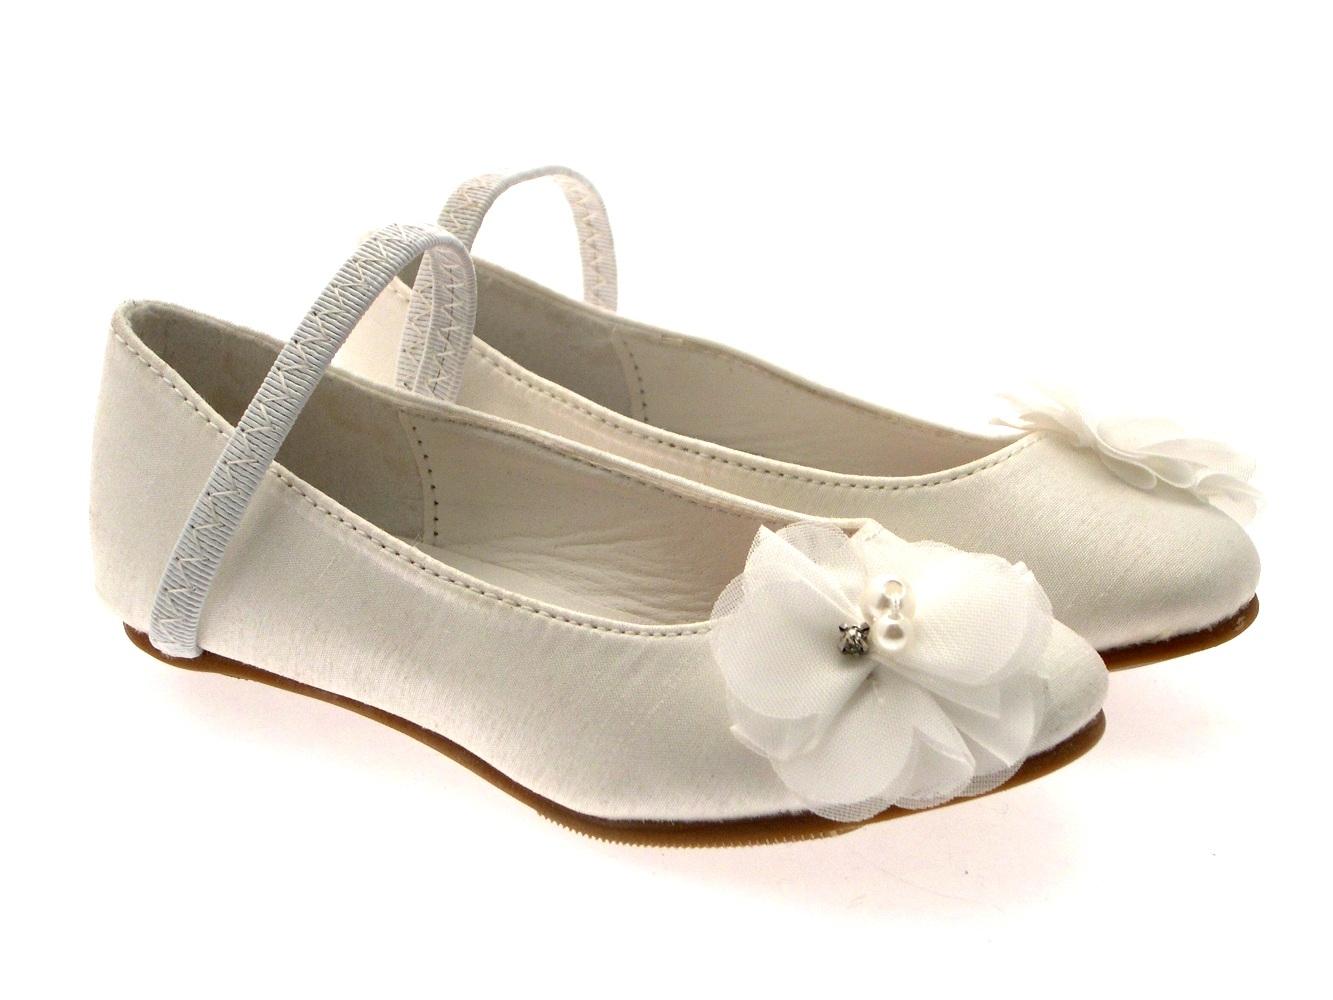 e9076b1ee43 Girls Satin Wedding Bridesmaids Shoes Low Heel Party Flower Sandals ...